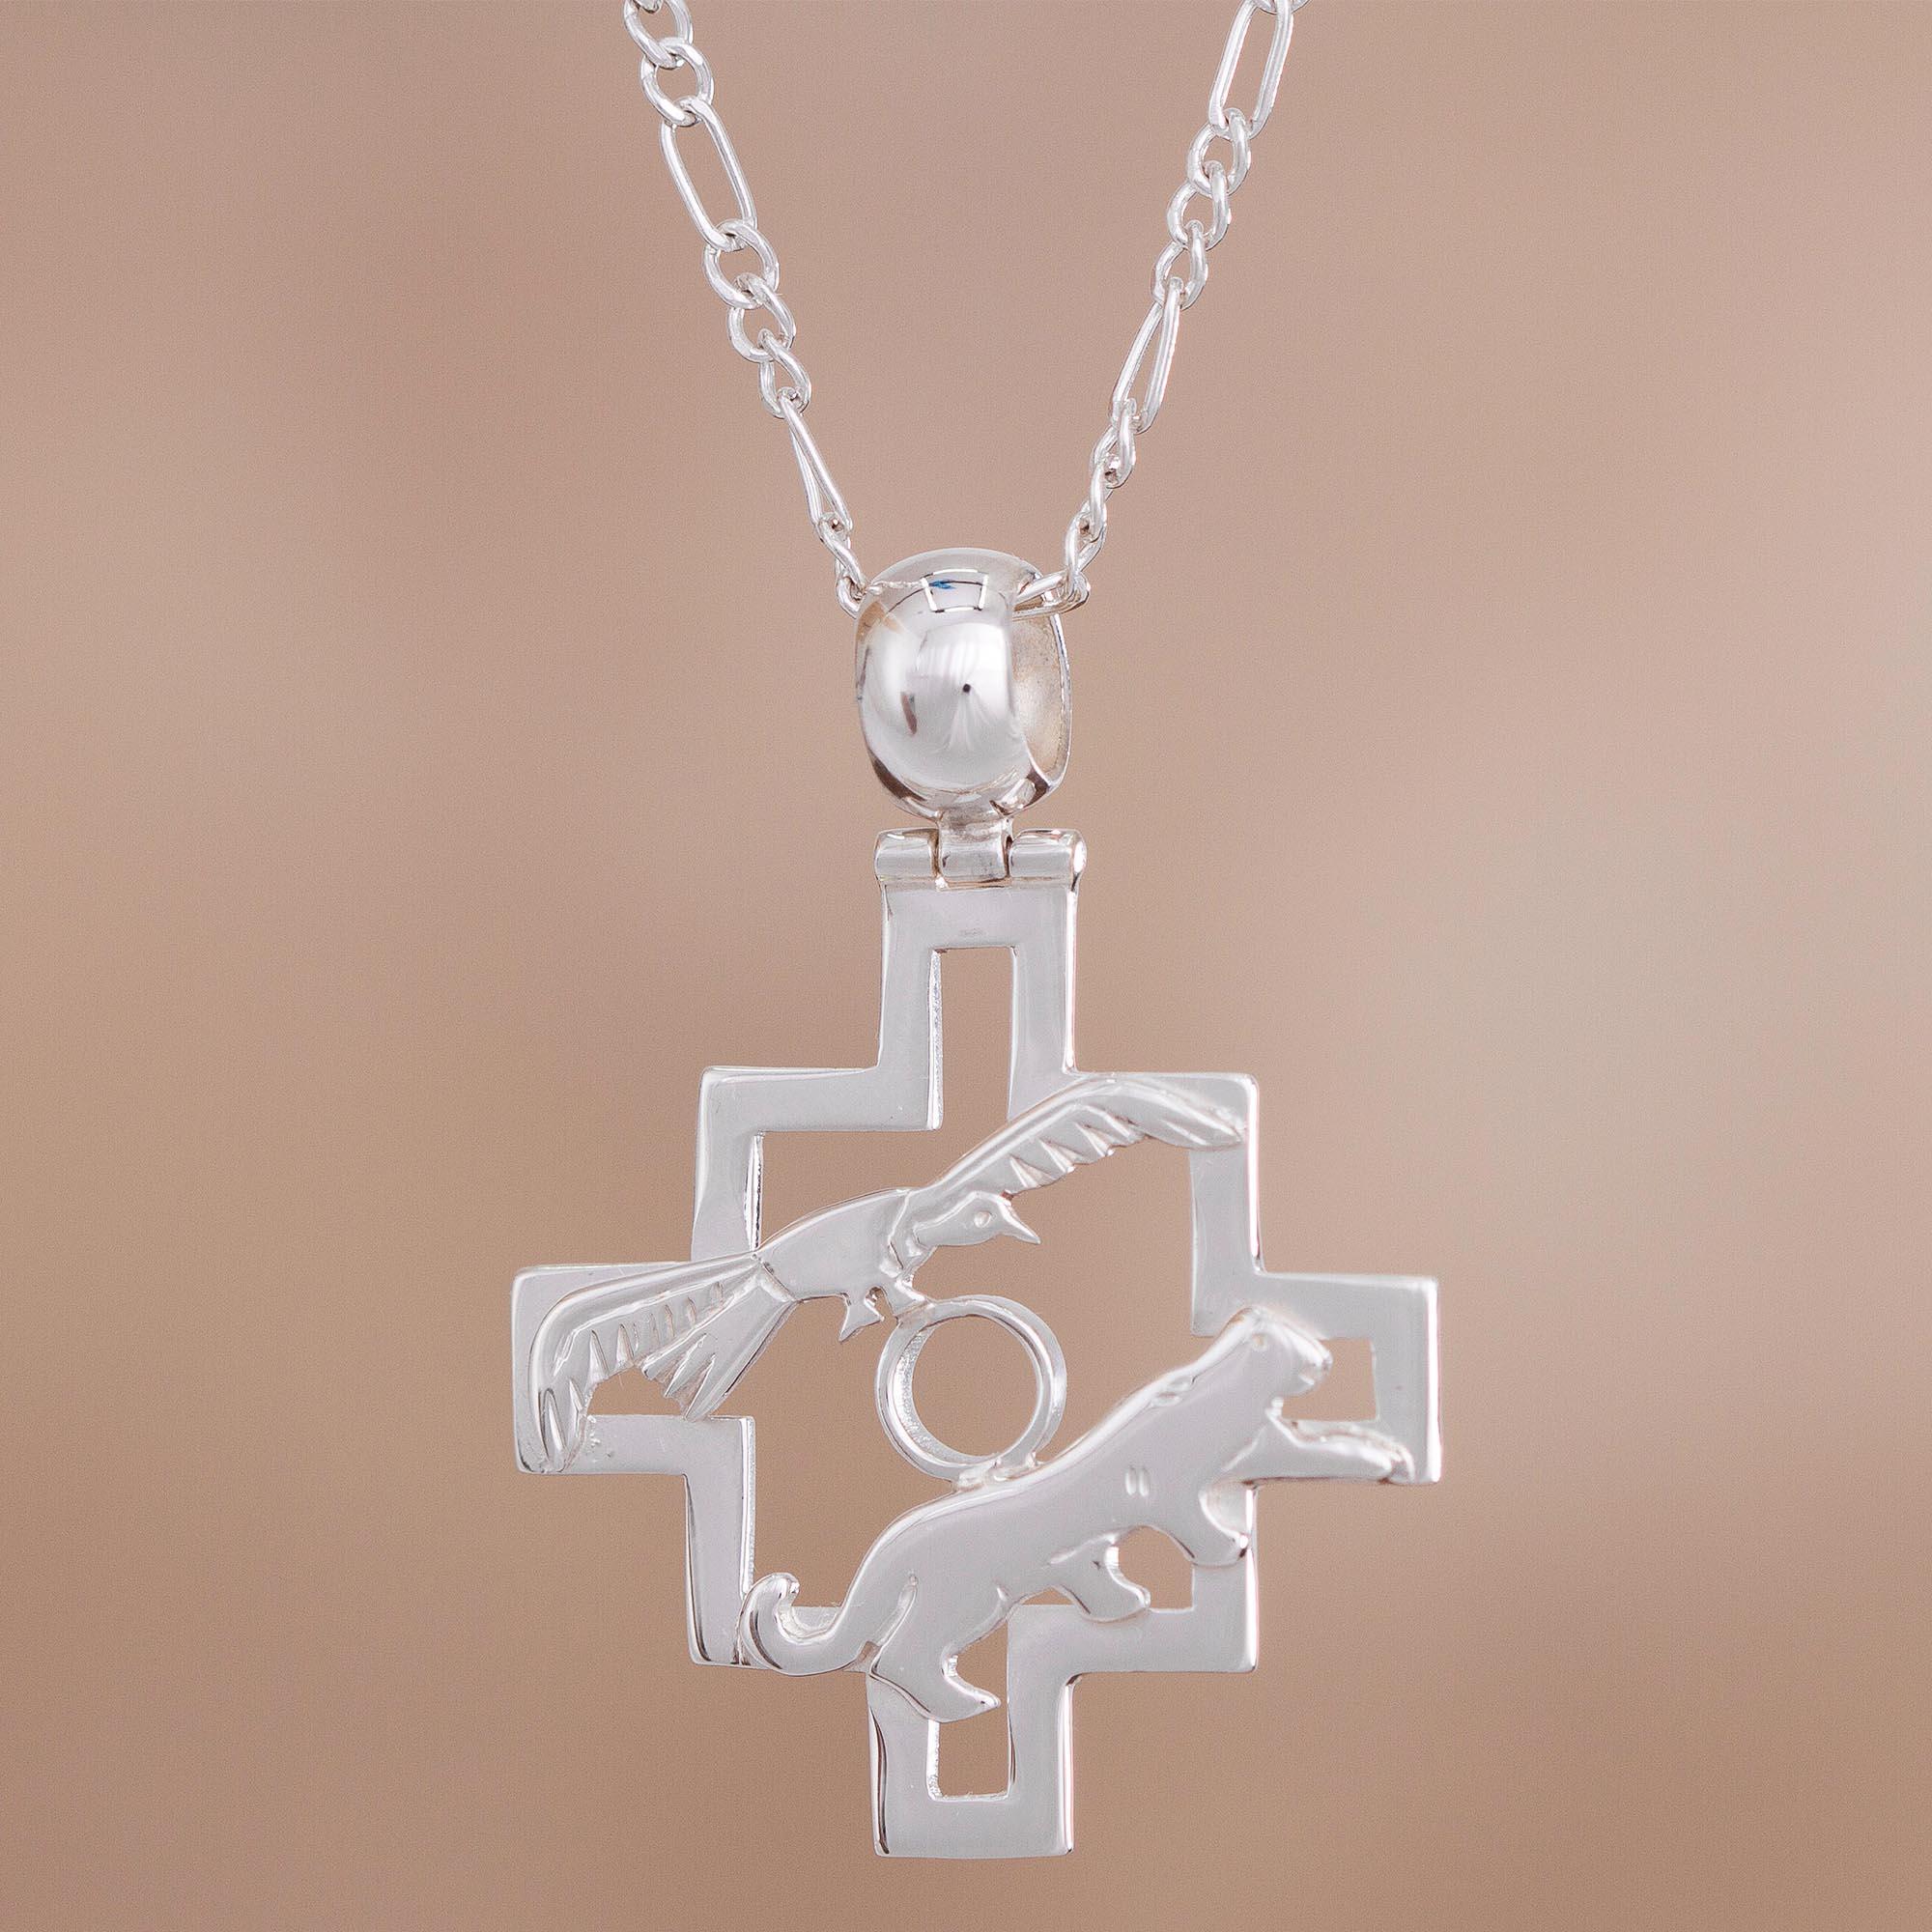 South American Inca Cross CERAMIC NECKLACE CHAKANA ..NEW DESIGN FROM PERU D